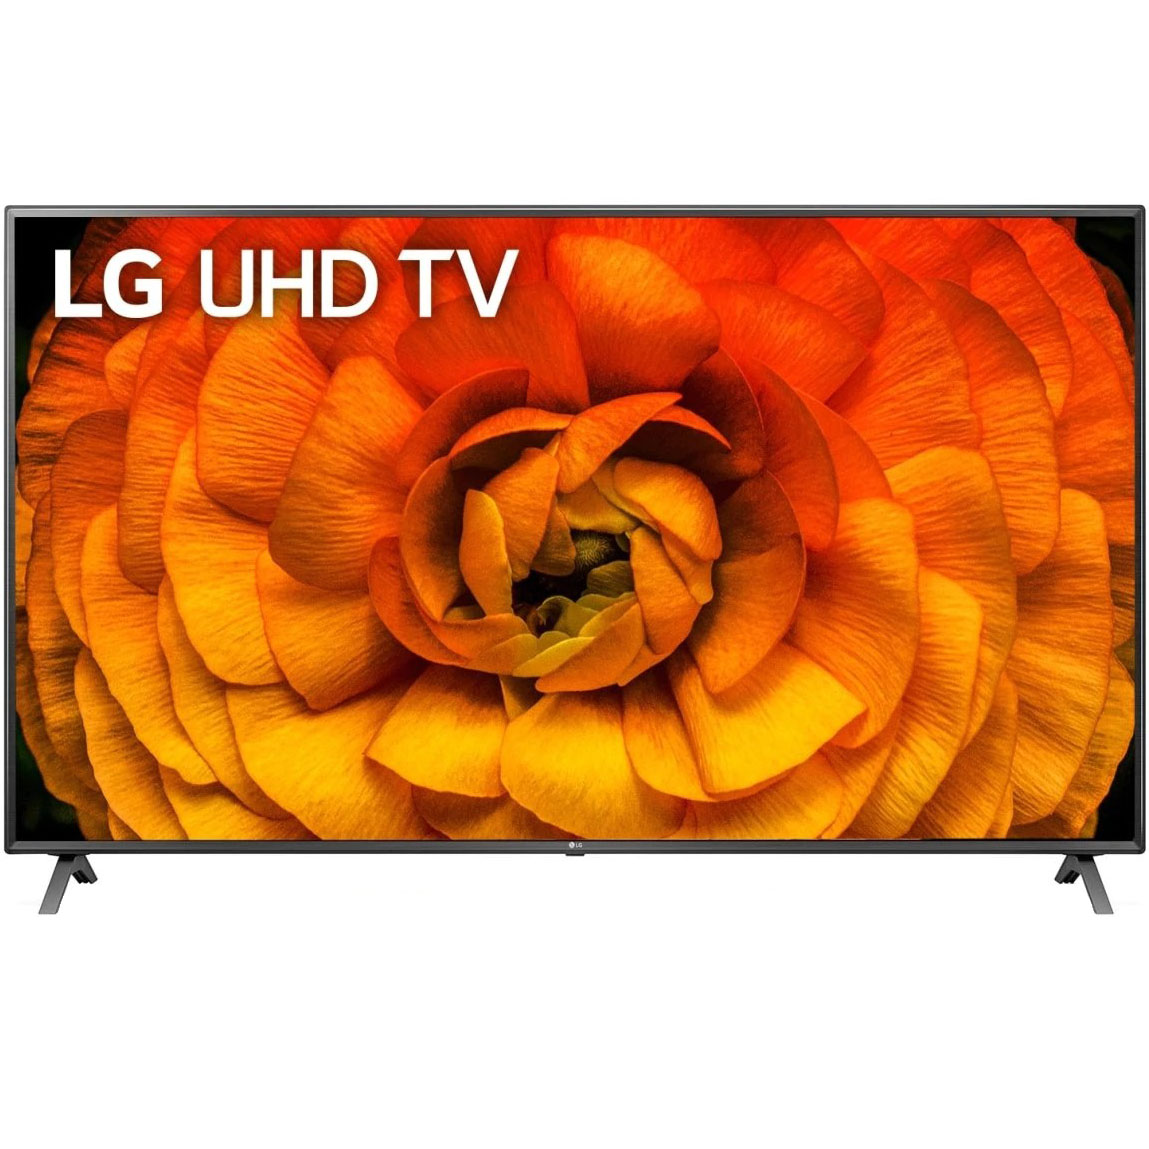 Фото - Телевизор LG 86UN85006LA 4k uhd телевизор lg 75un70706lc